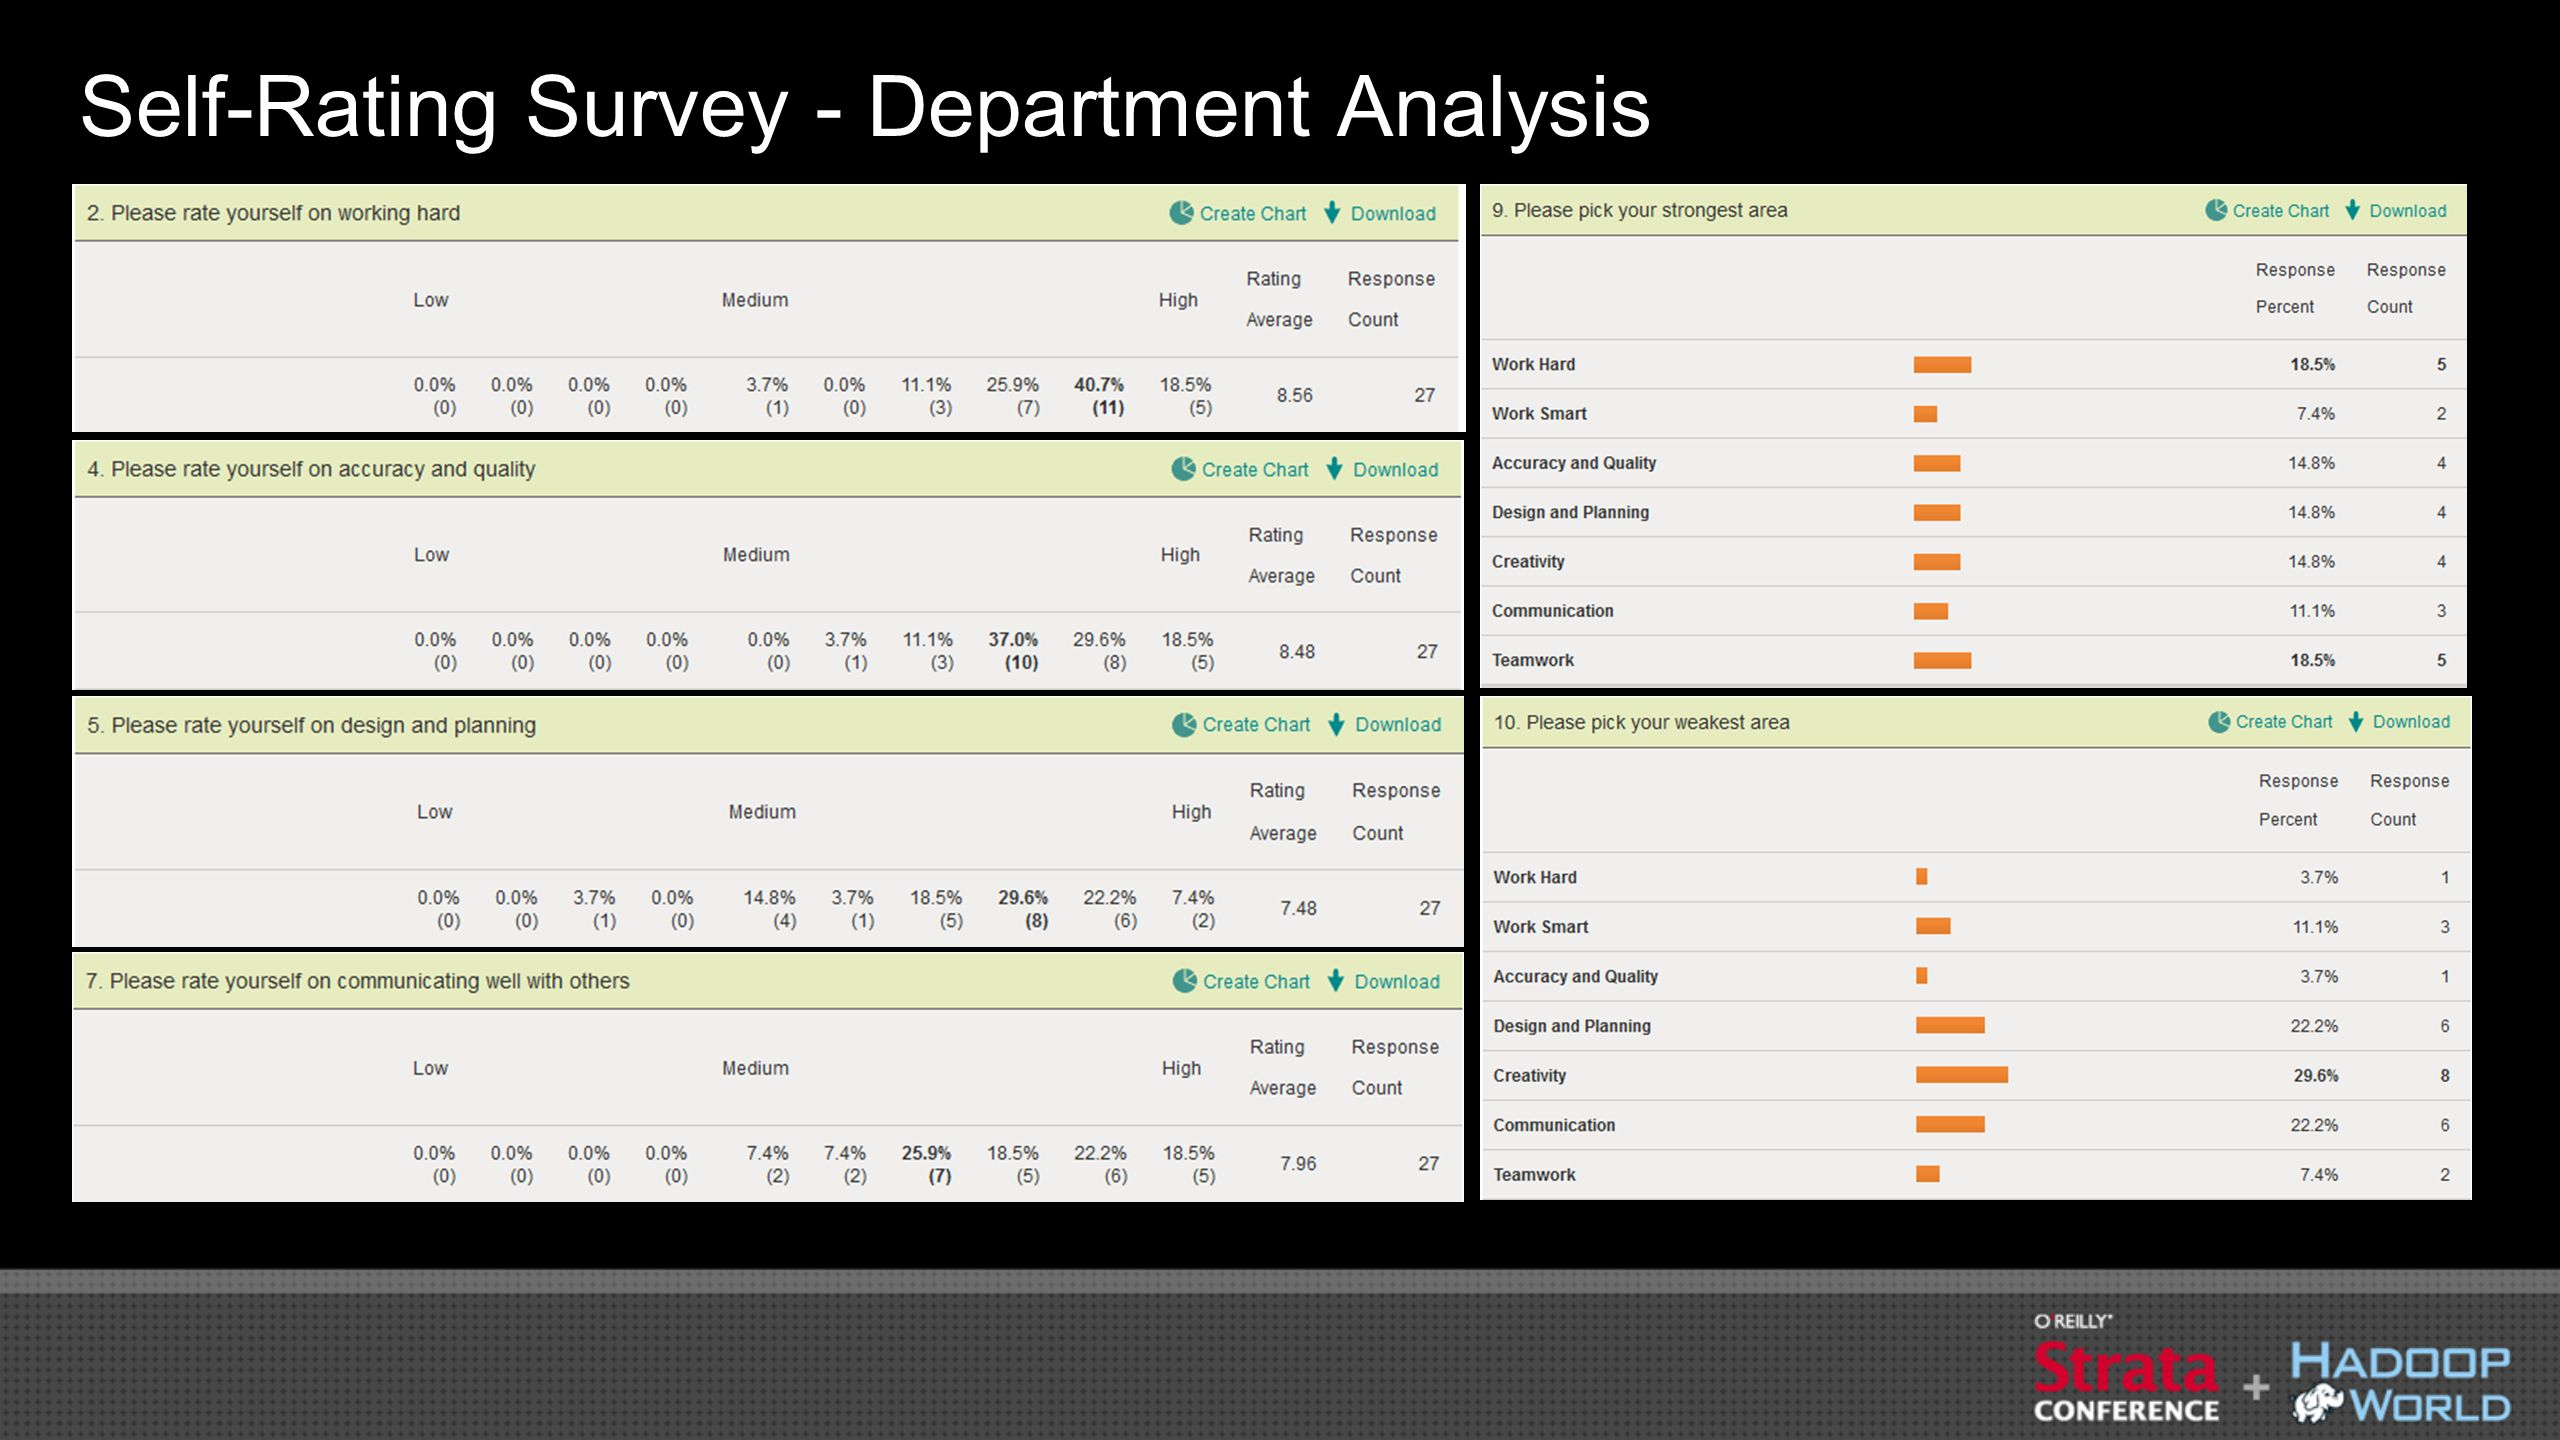 Self-Rating Survey - Department Analysis